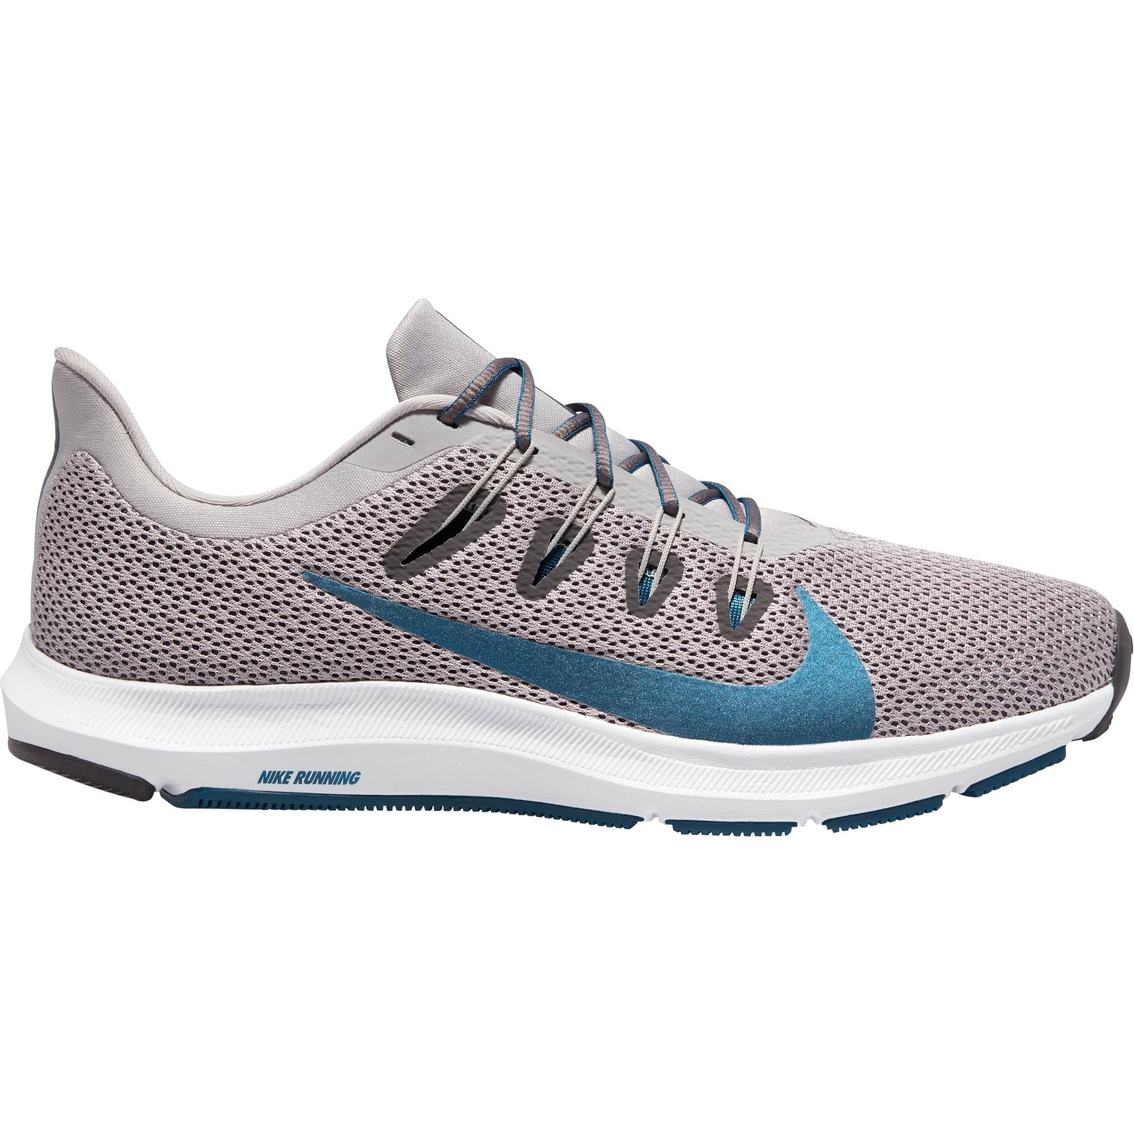 huella dactilar recepción Inconsistente  Nike Men's Quest 2 Running Shoes | Running | Shoes | Shop The Exchange